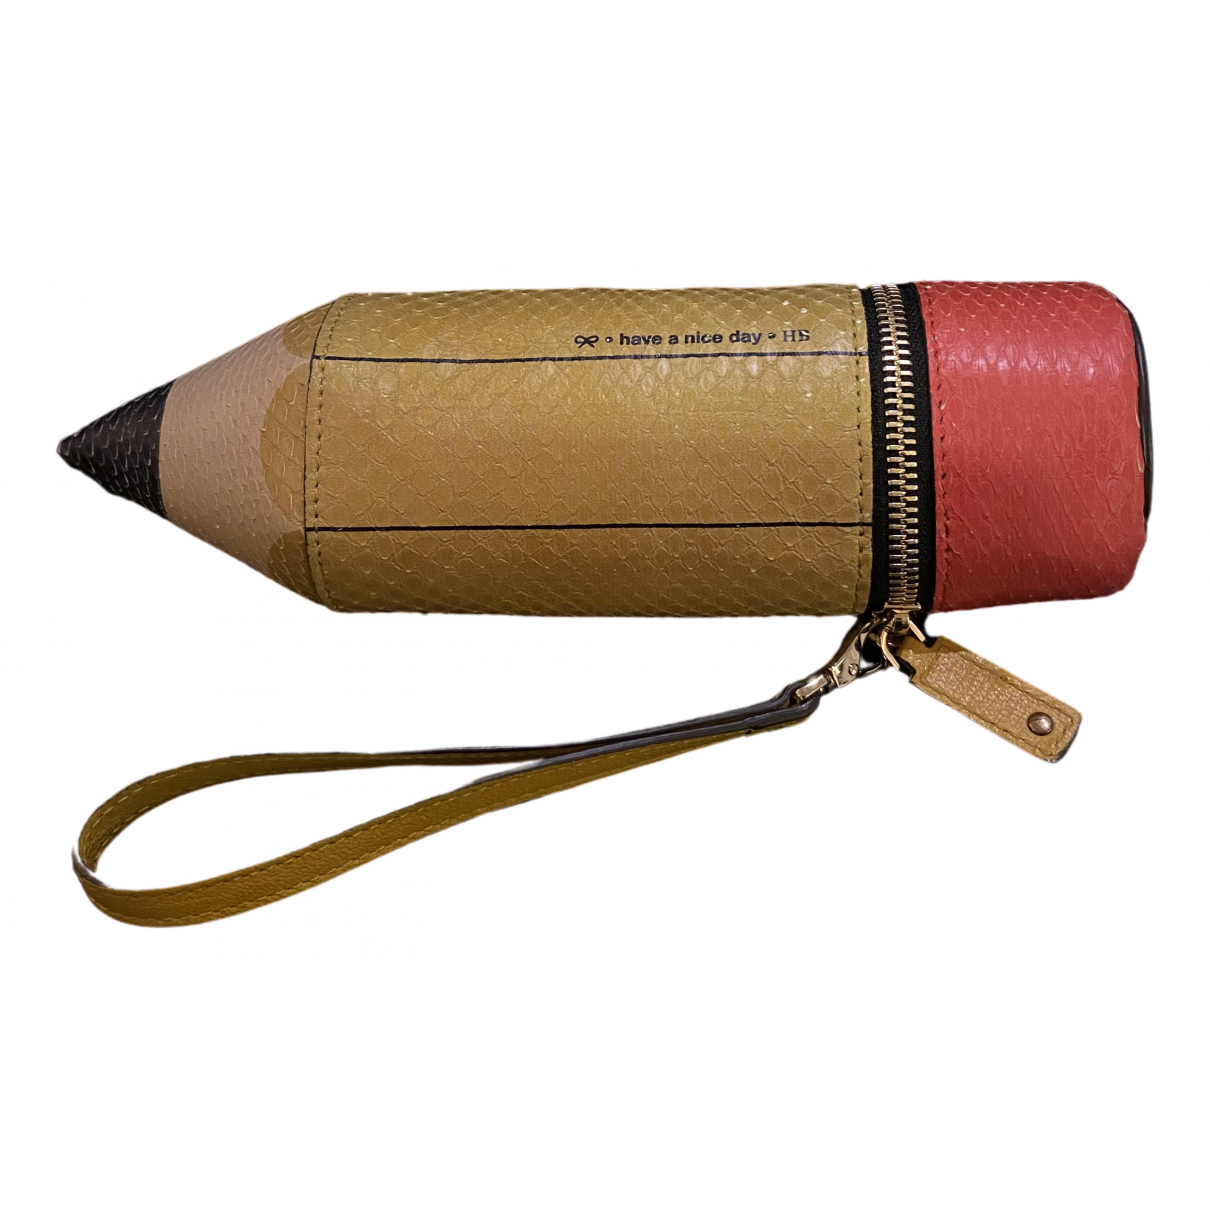 Anya Hindmarch \N Yellow Leather Clutch bag for Women \N